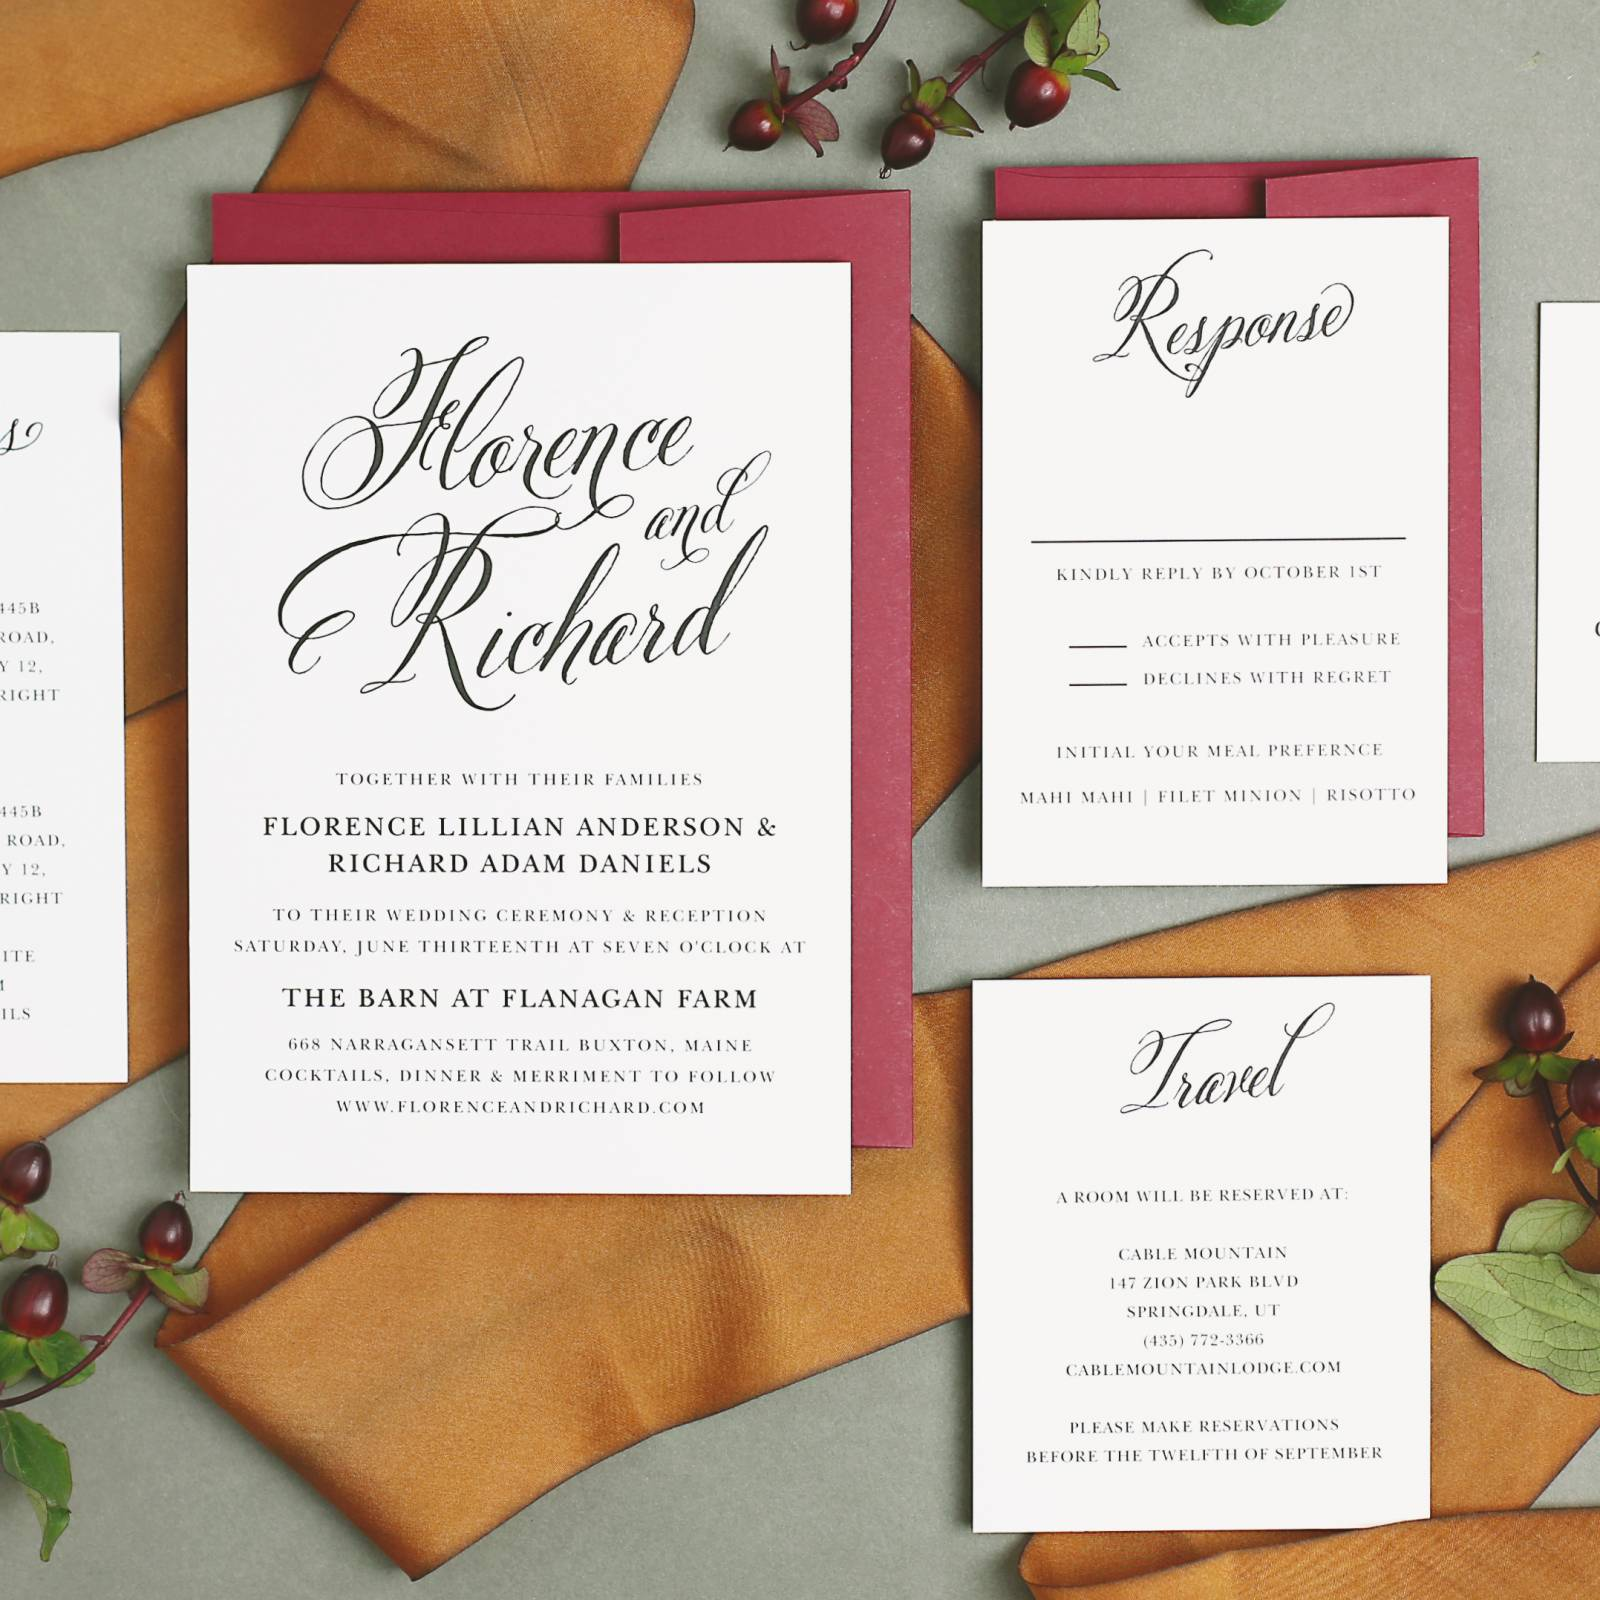 Basic Invite: Customizable Online Wedding Invitation Suites ...